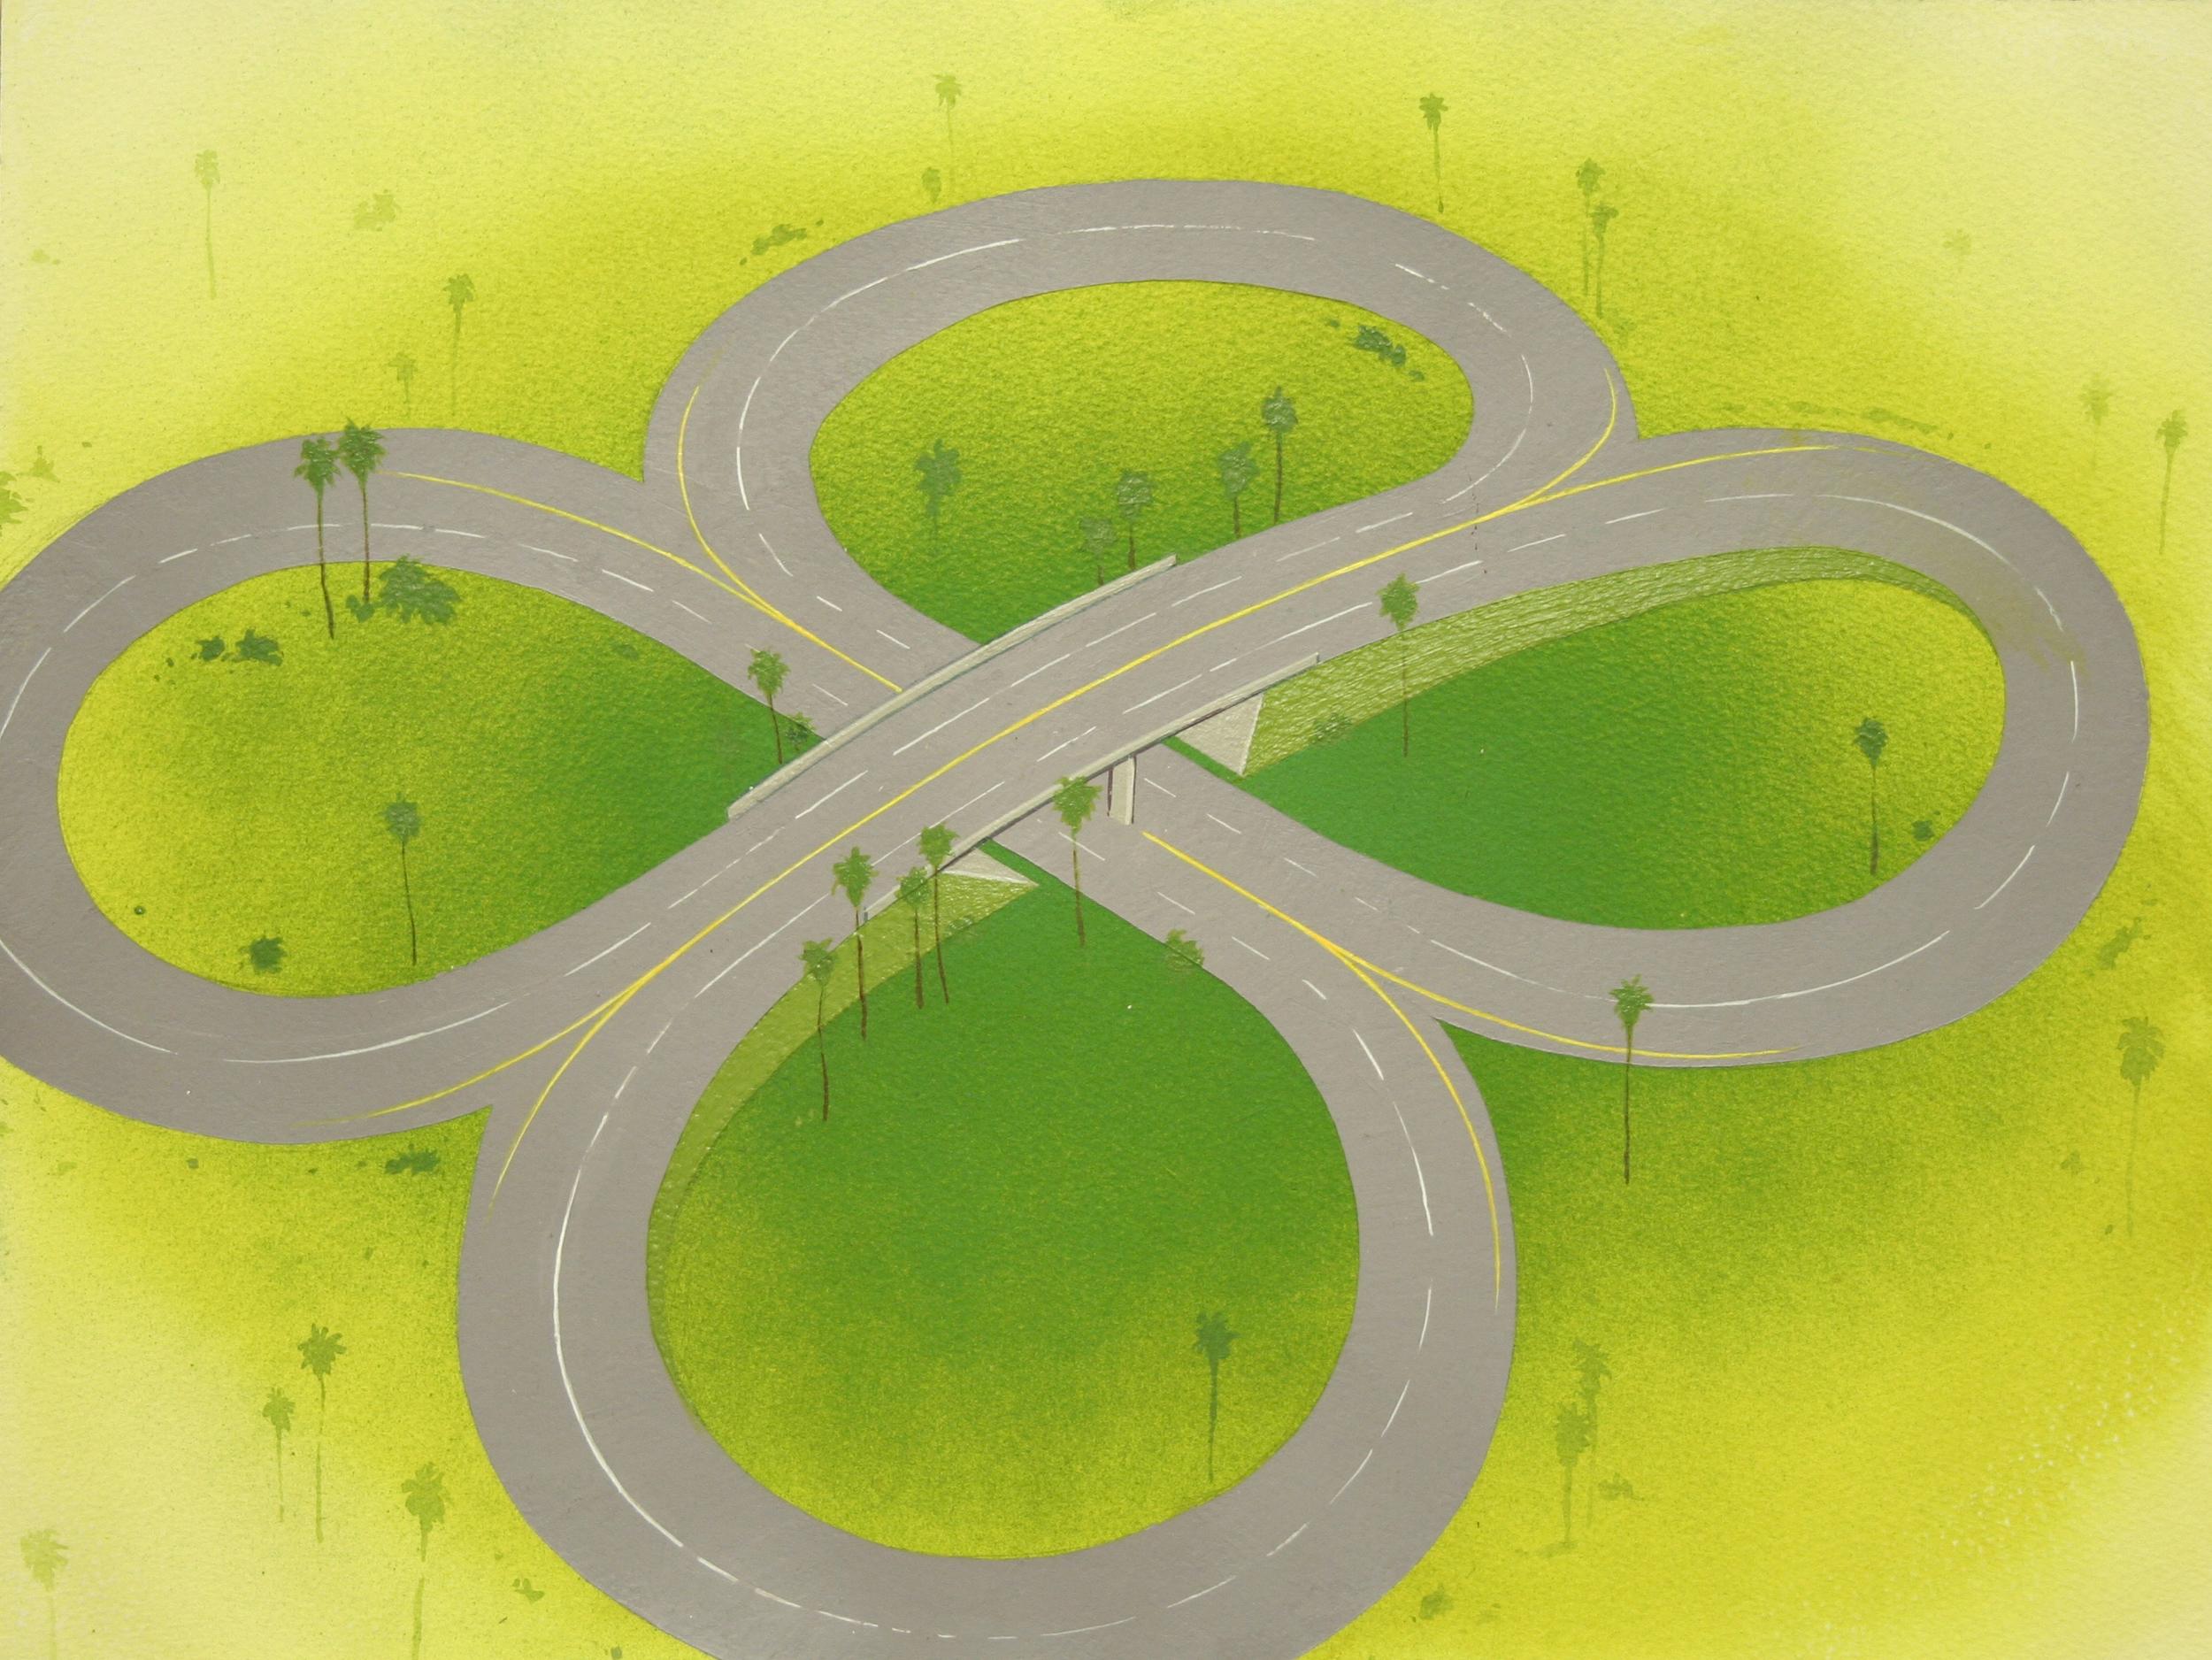 Chris Ballantyne   Interchange  2015 acrylic on paper 12 x 16 in